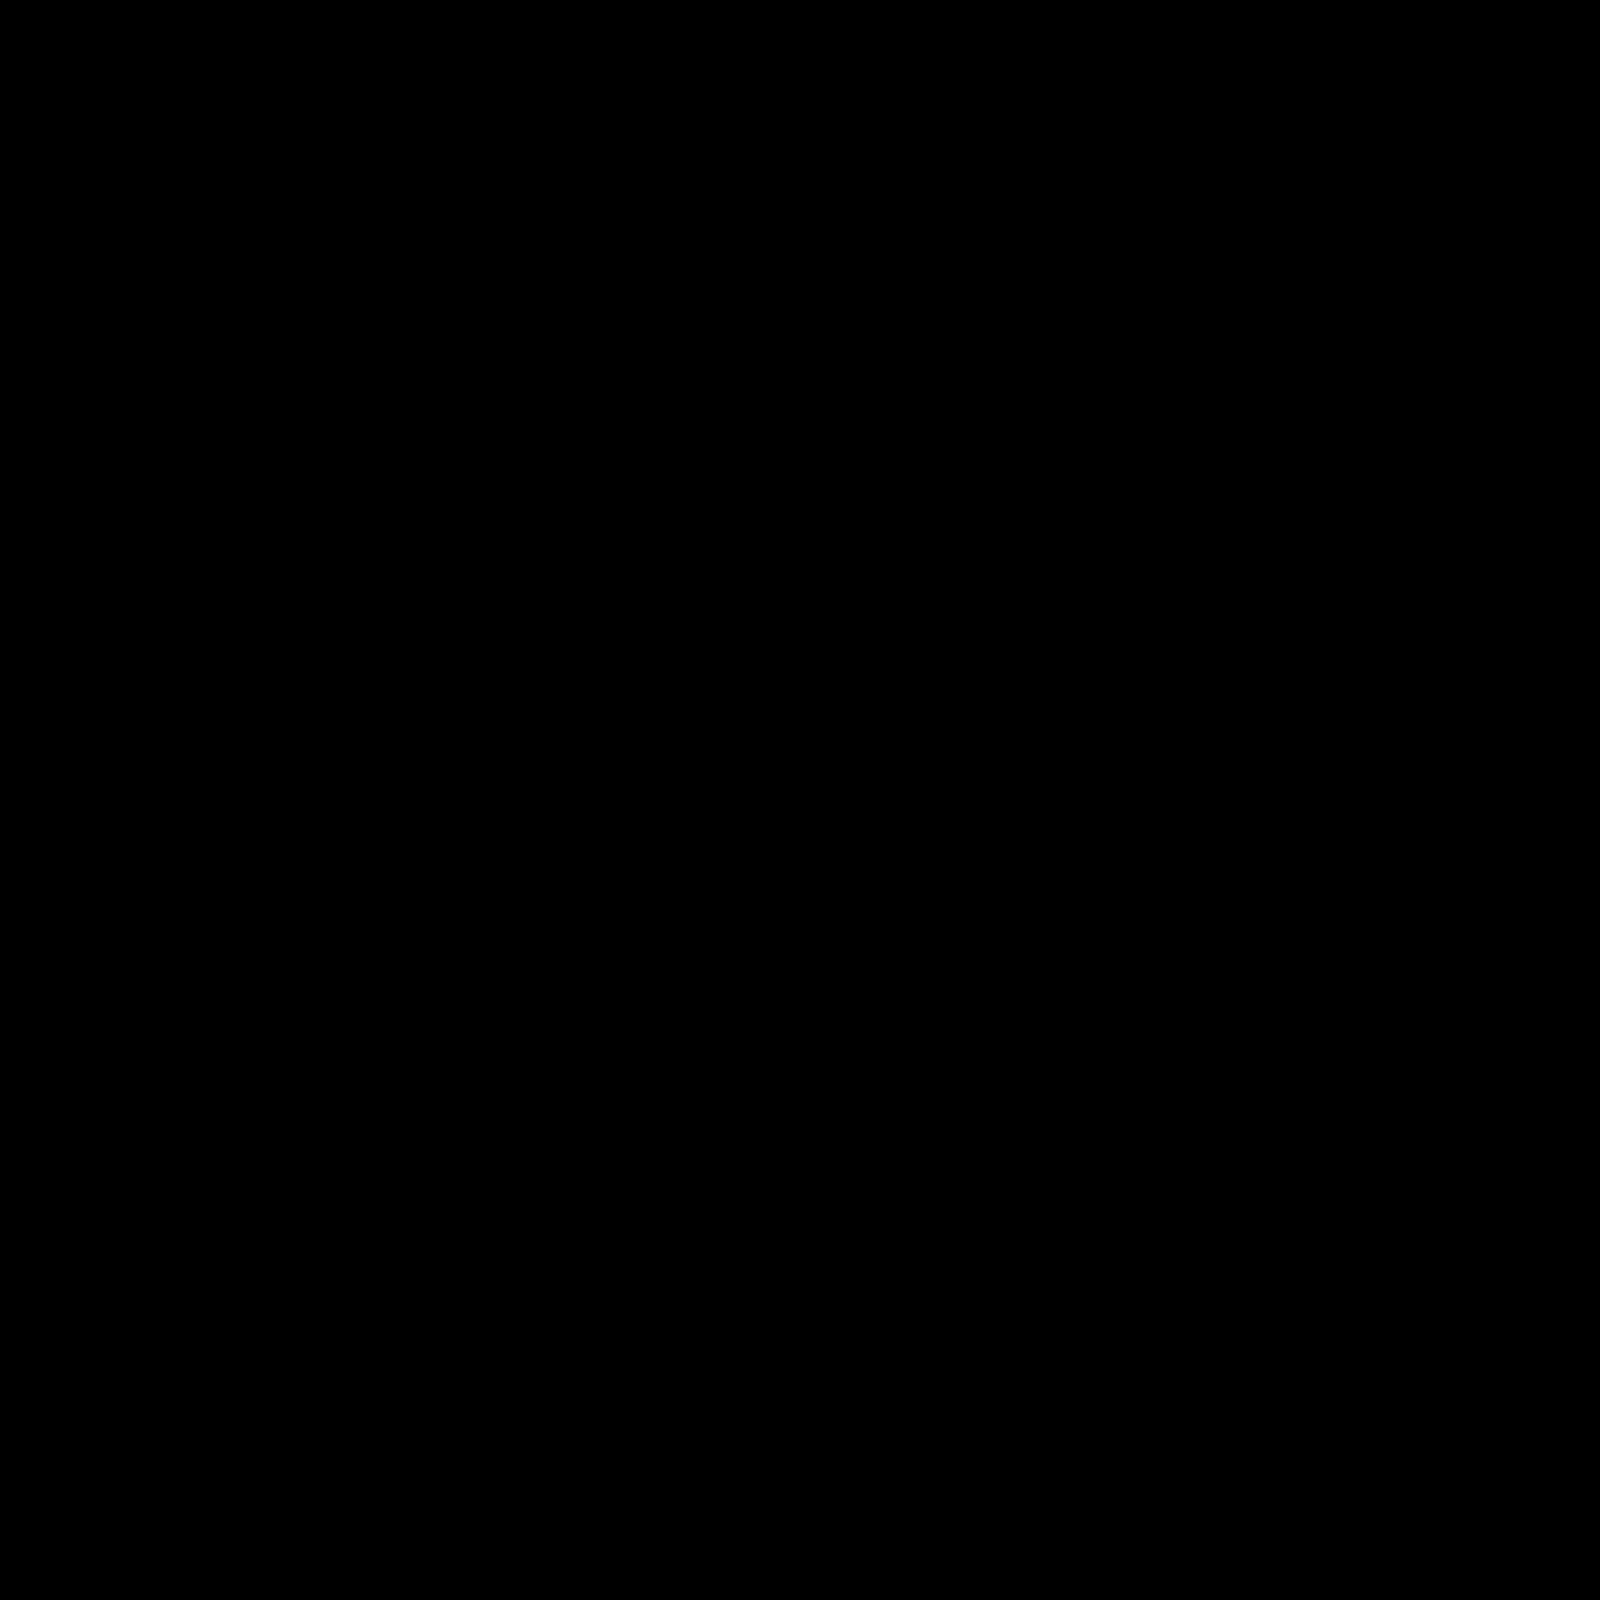 Бурдж аль-Араб icon